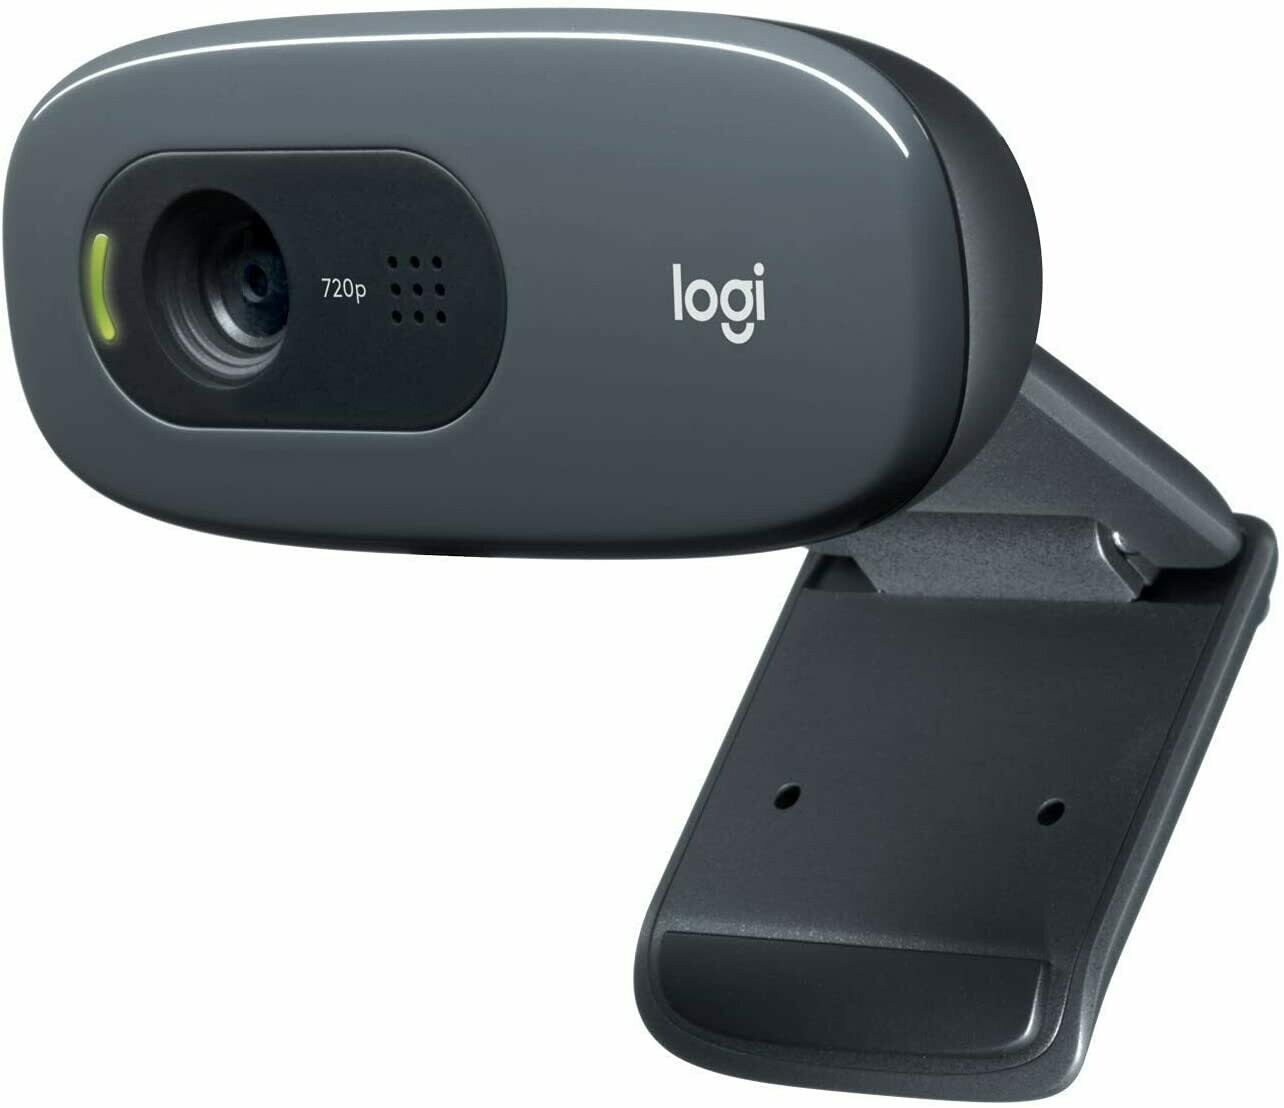 Logitech C270 HD 720p/30fps, Widescreen HD Video Calling, HD Light Correction, Noise-Reducing Mic,  Skype, FaceTime, Hangouts, WebEx, PC & Mac